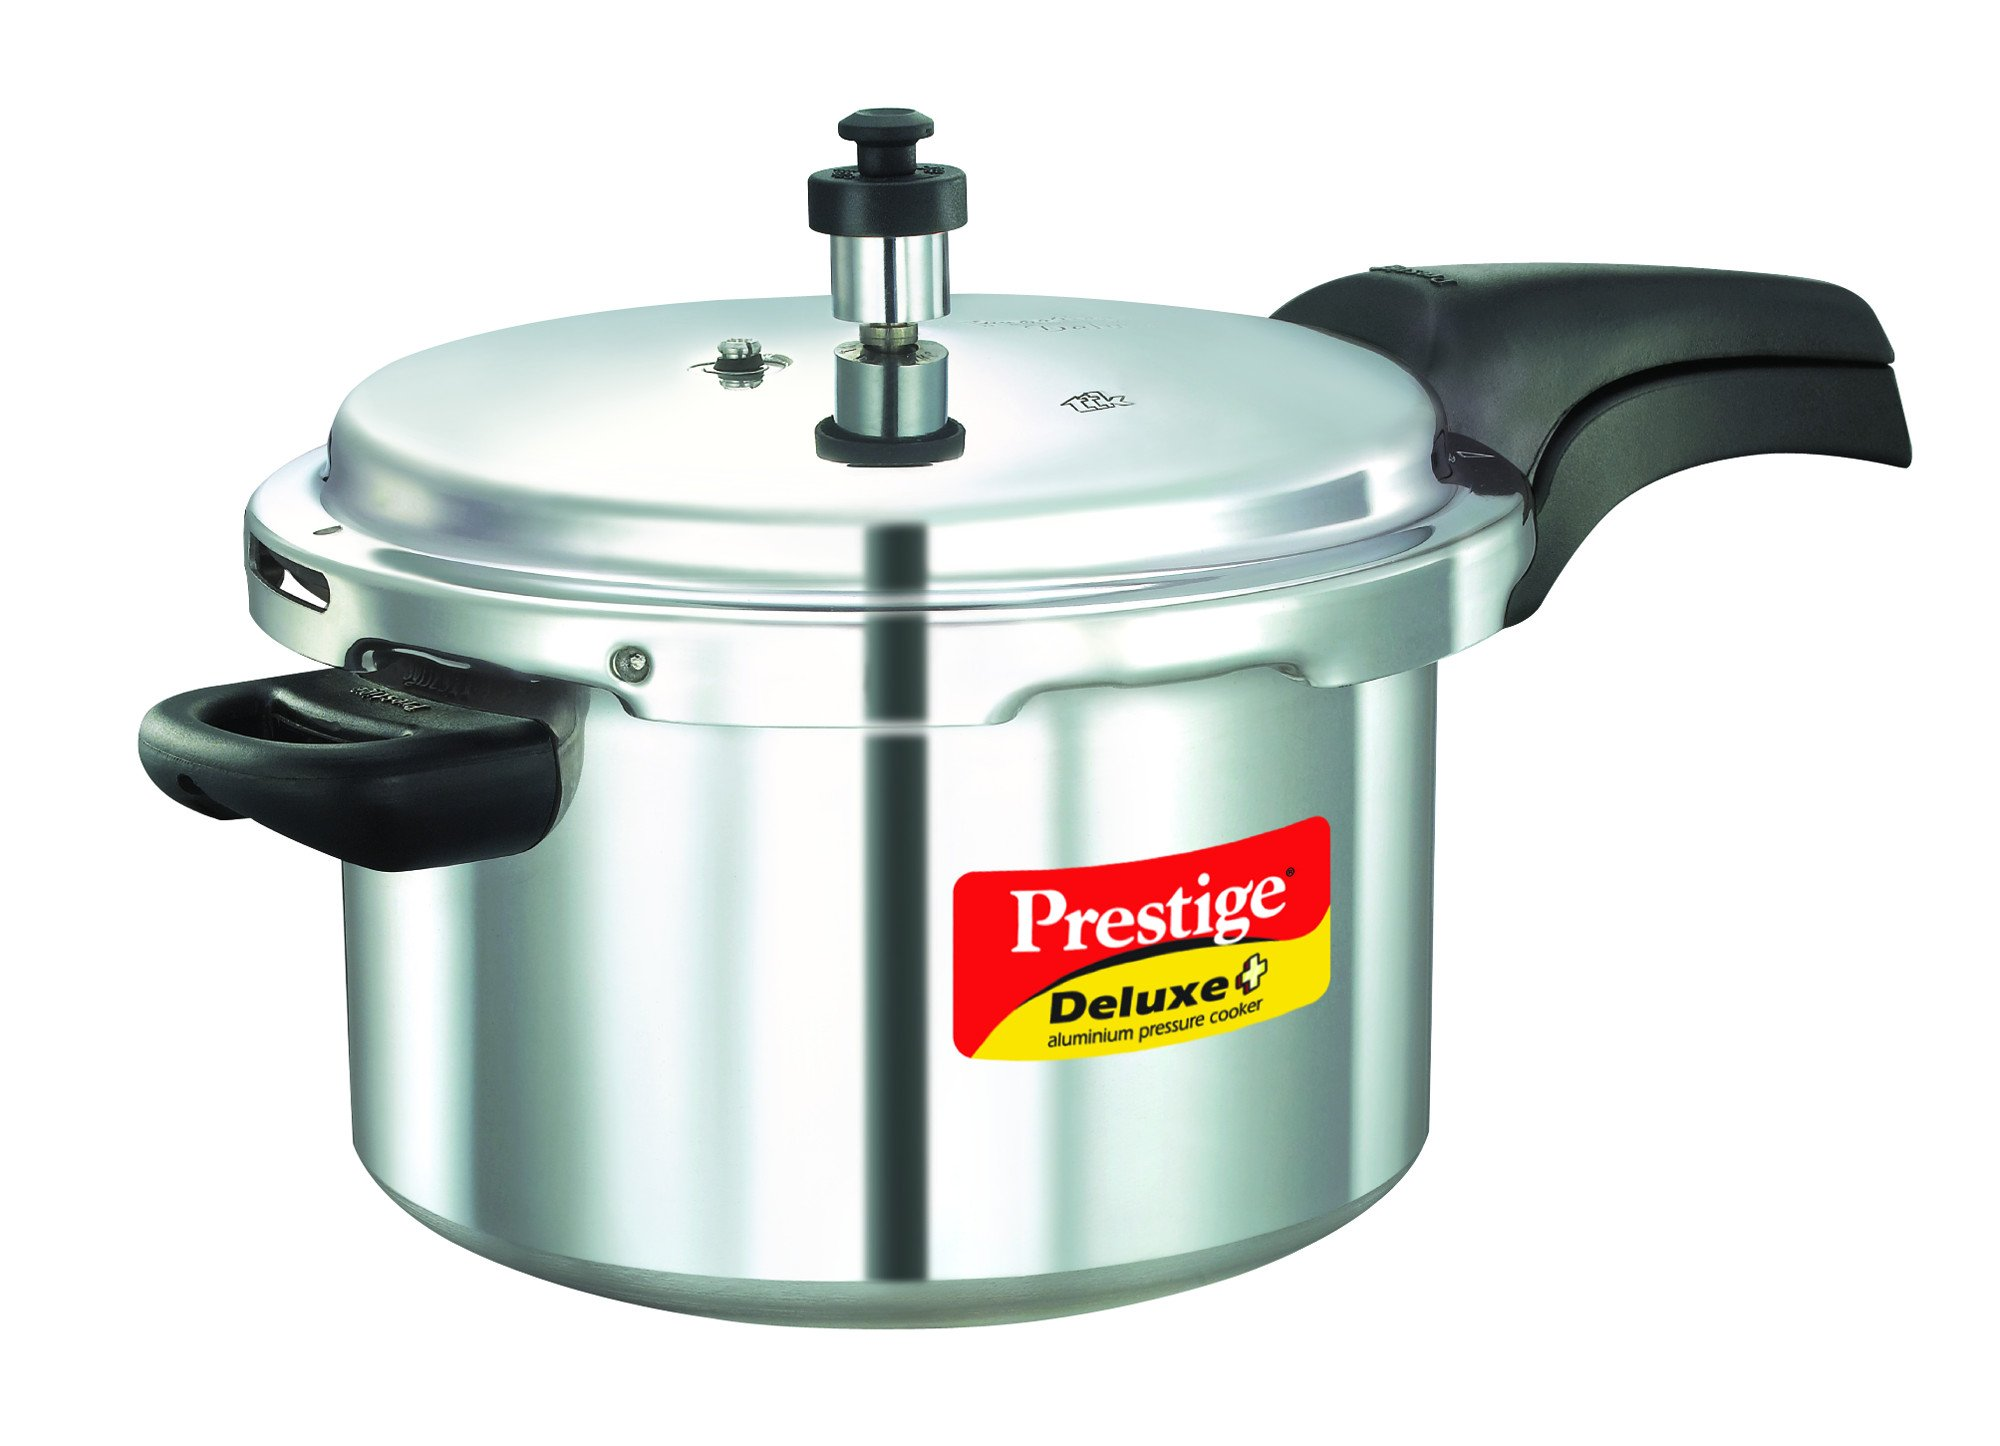 Prestige Deluxe Plus Aluminum Pressure Cooker, 5 Liter by Prestige